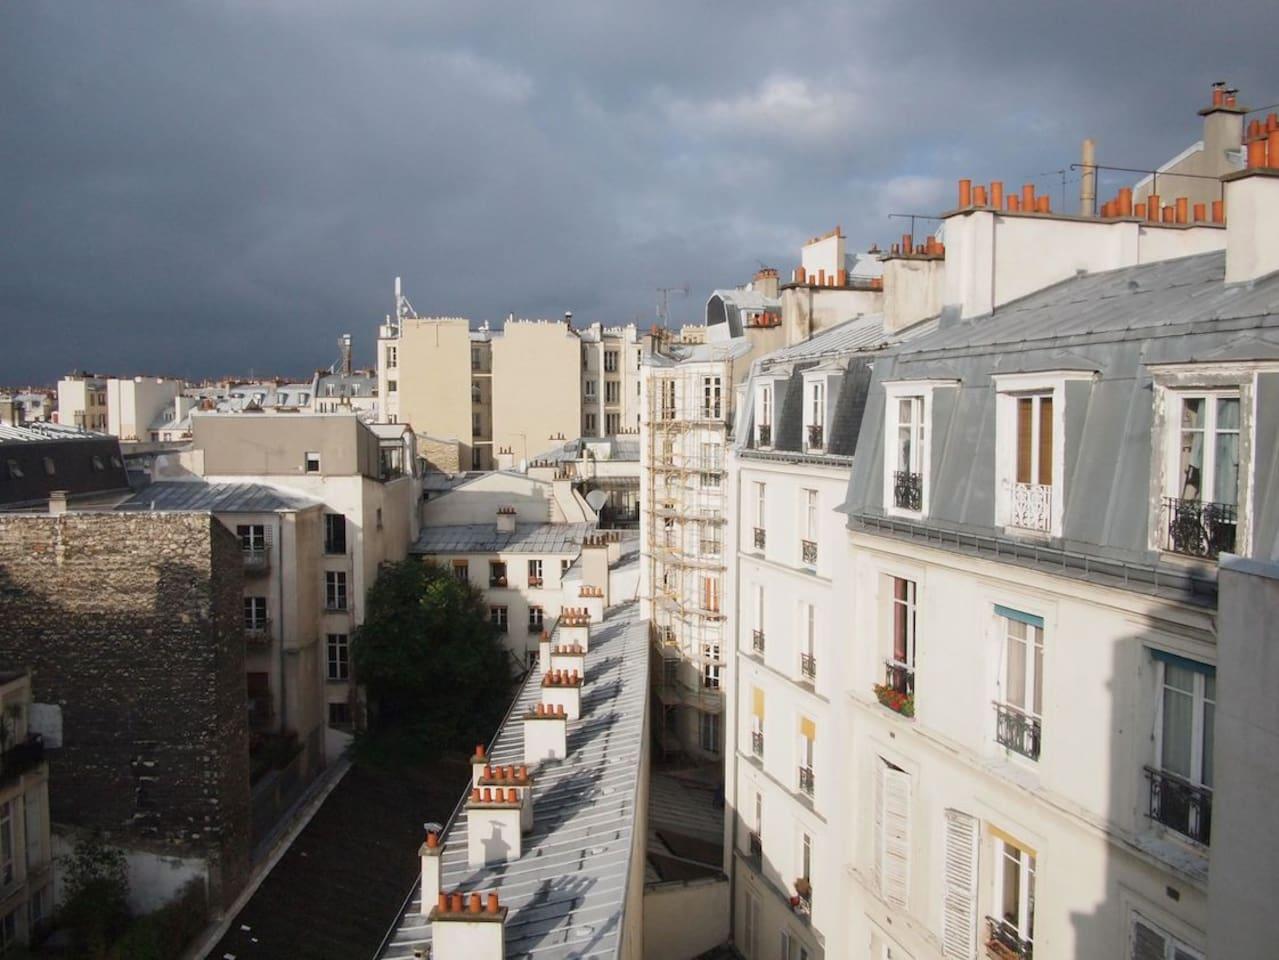 Artist Studio near Montmartre-Paris